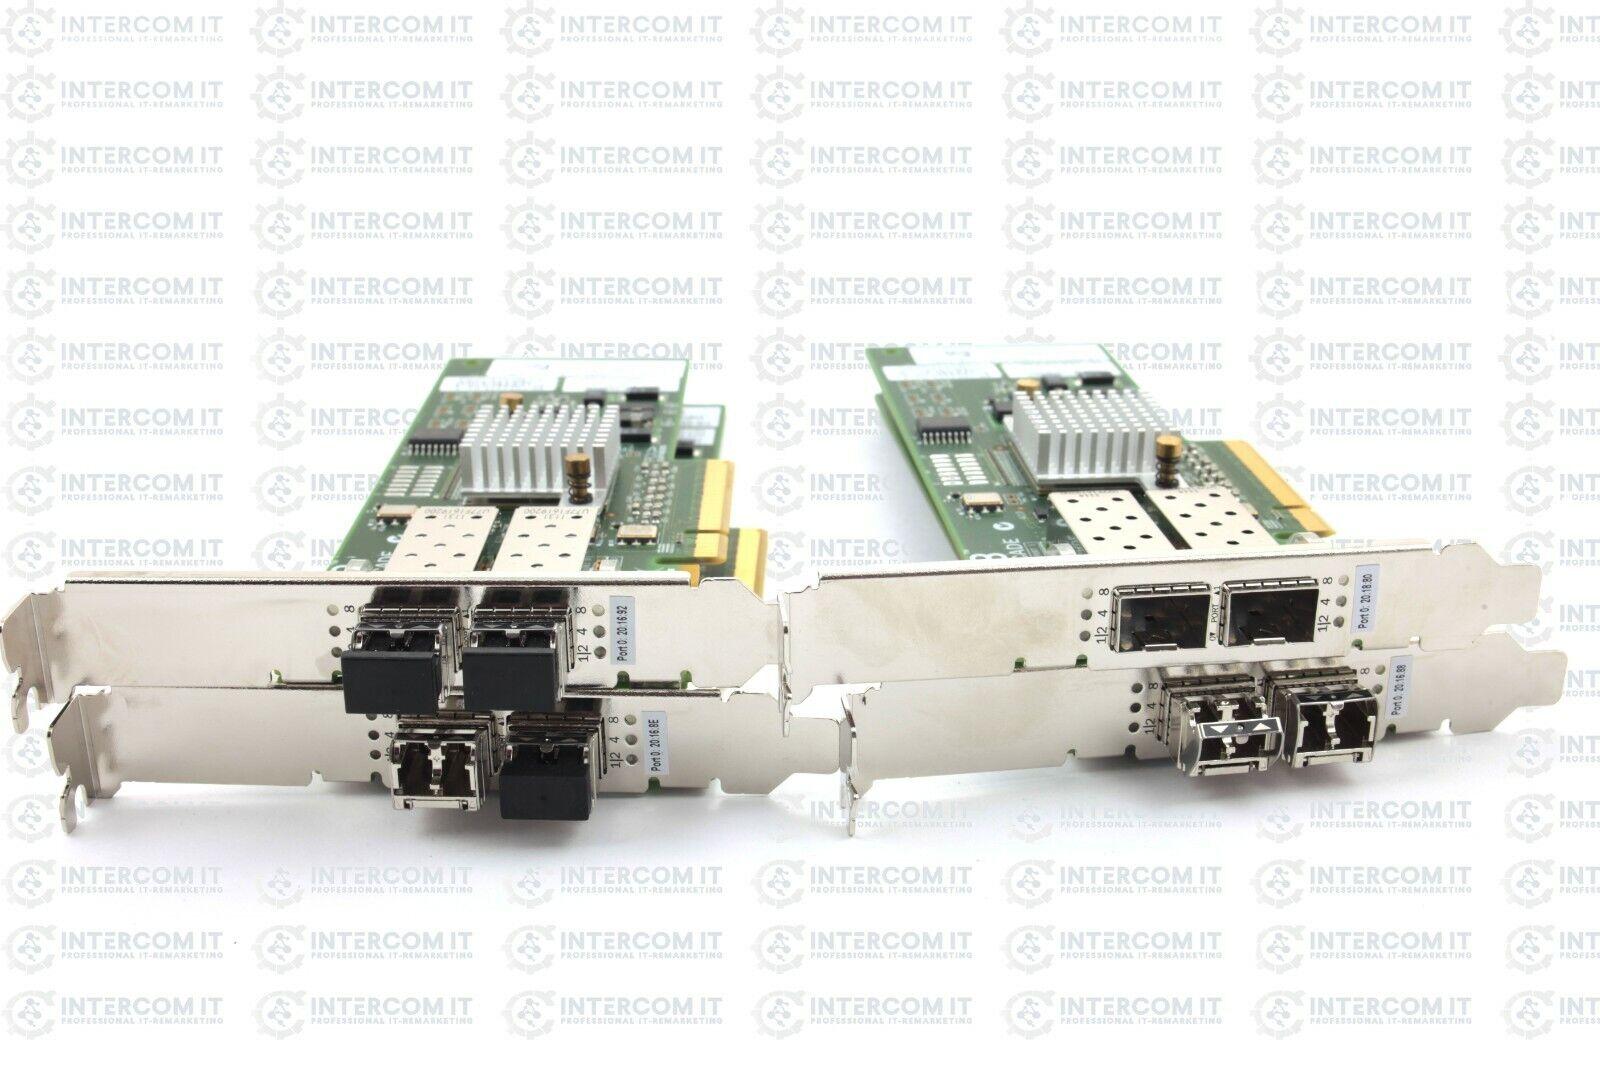 4x Dell 05 gyty FC Controller Brocade 825 8Gb DP FC PCI